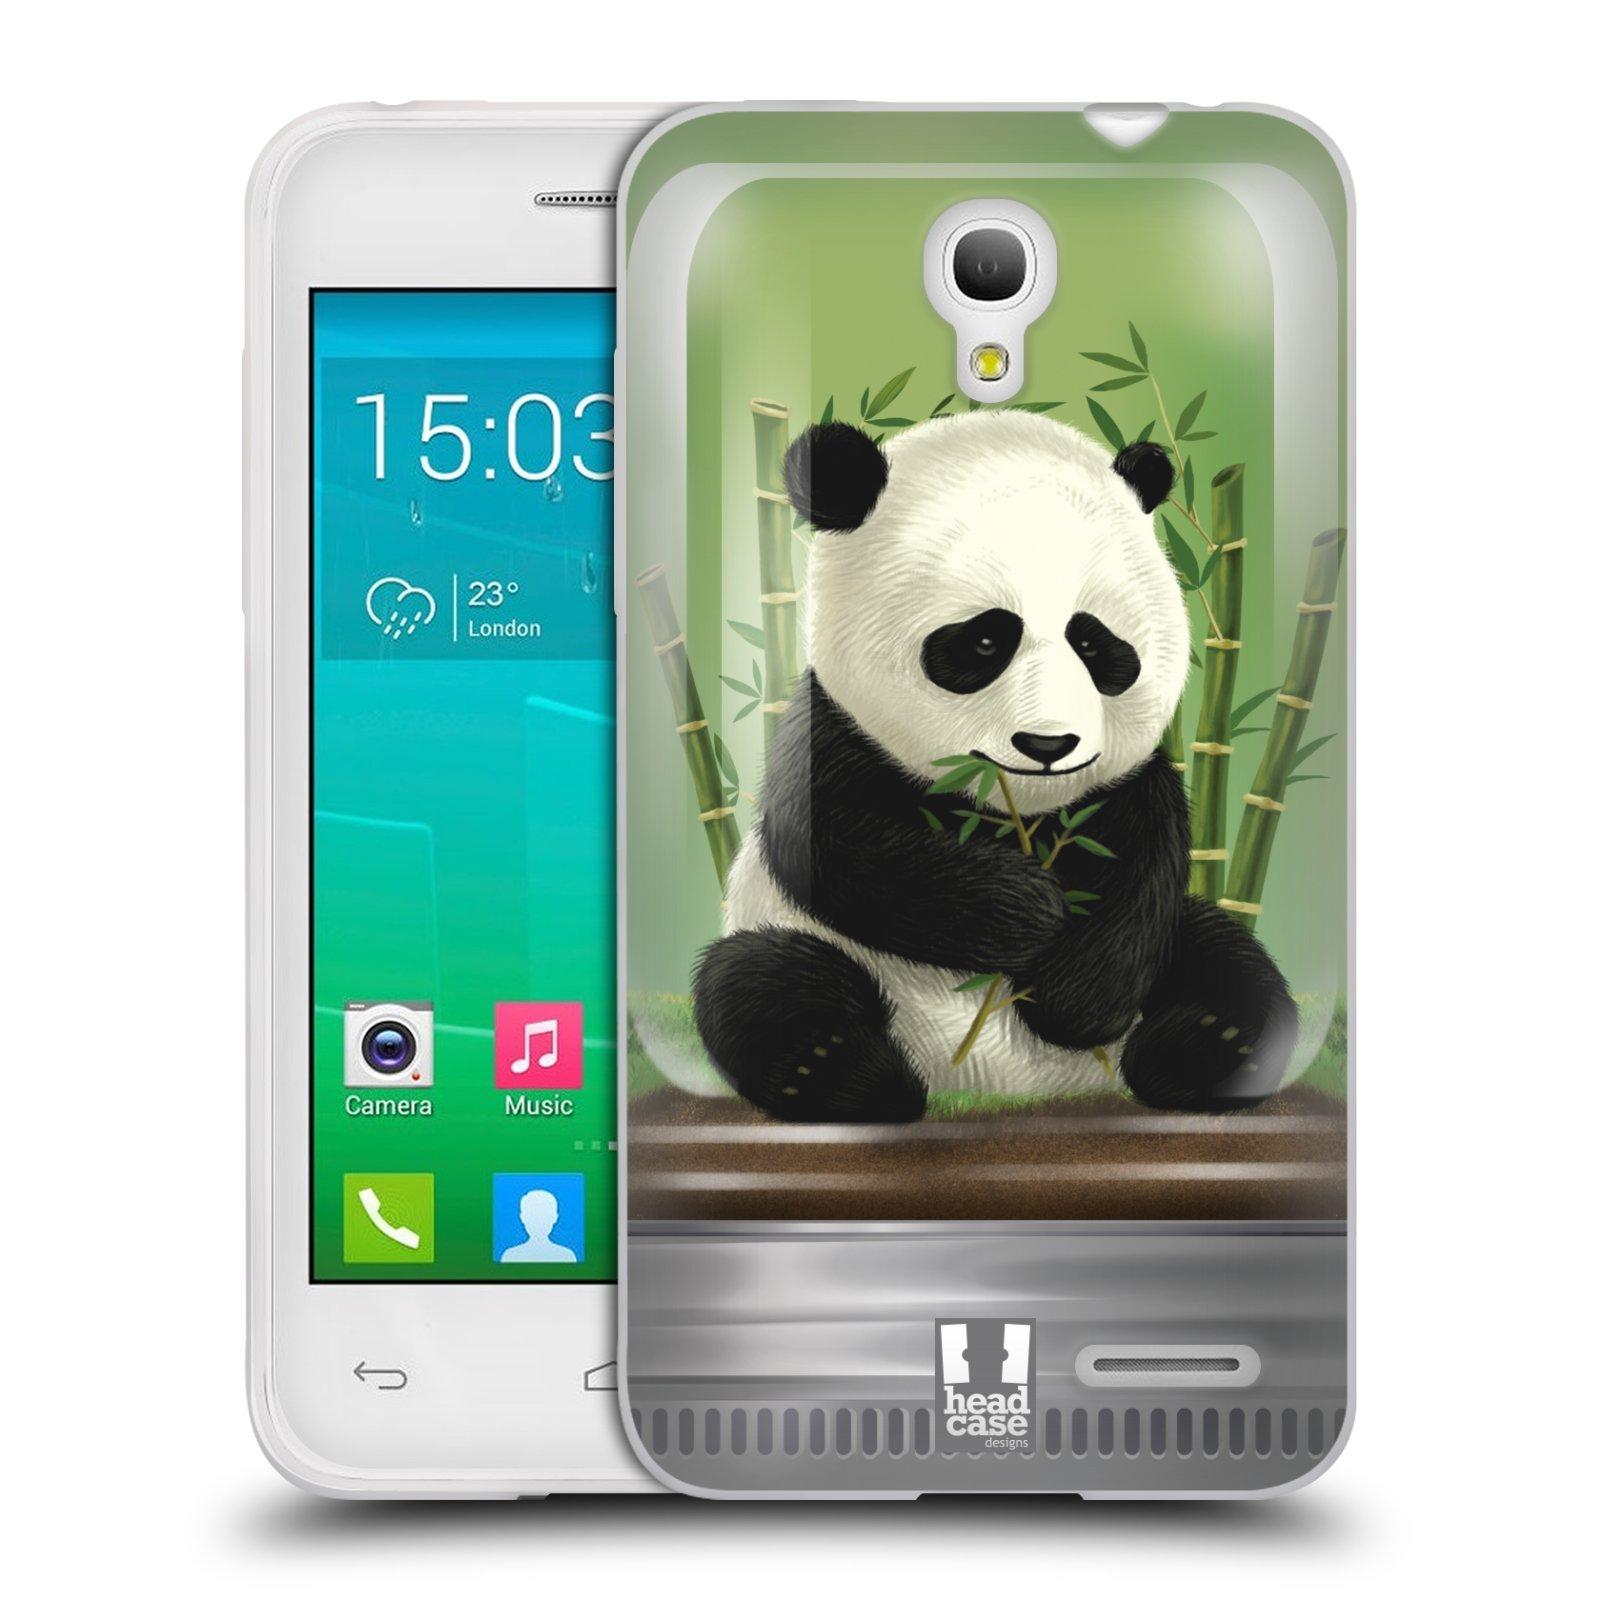 HEAD CASE silikonový obal na mobil Alcatel POP S3 OT-5050Y vzor Zvířátka v těžítku panda